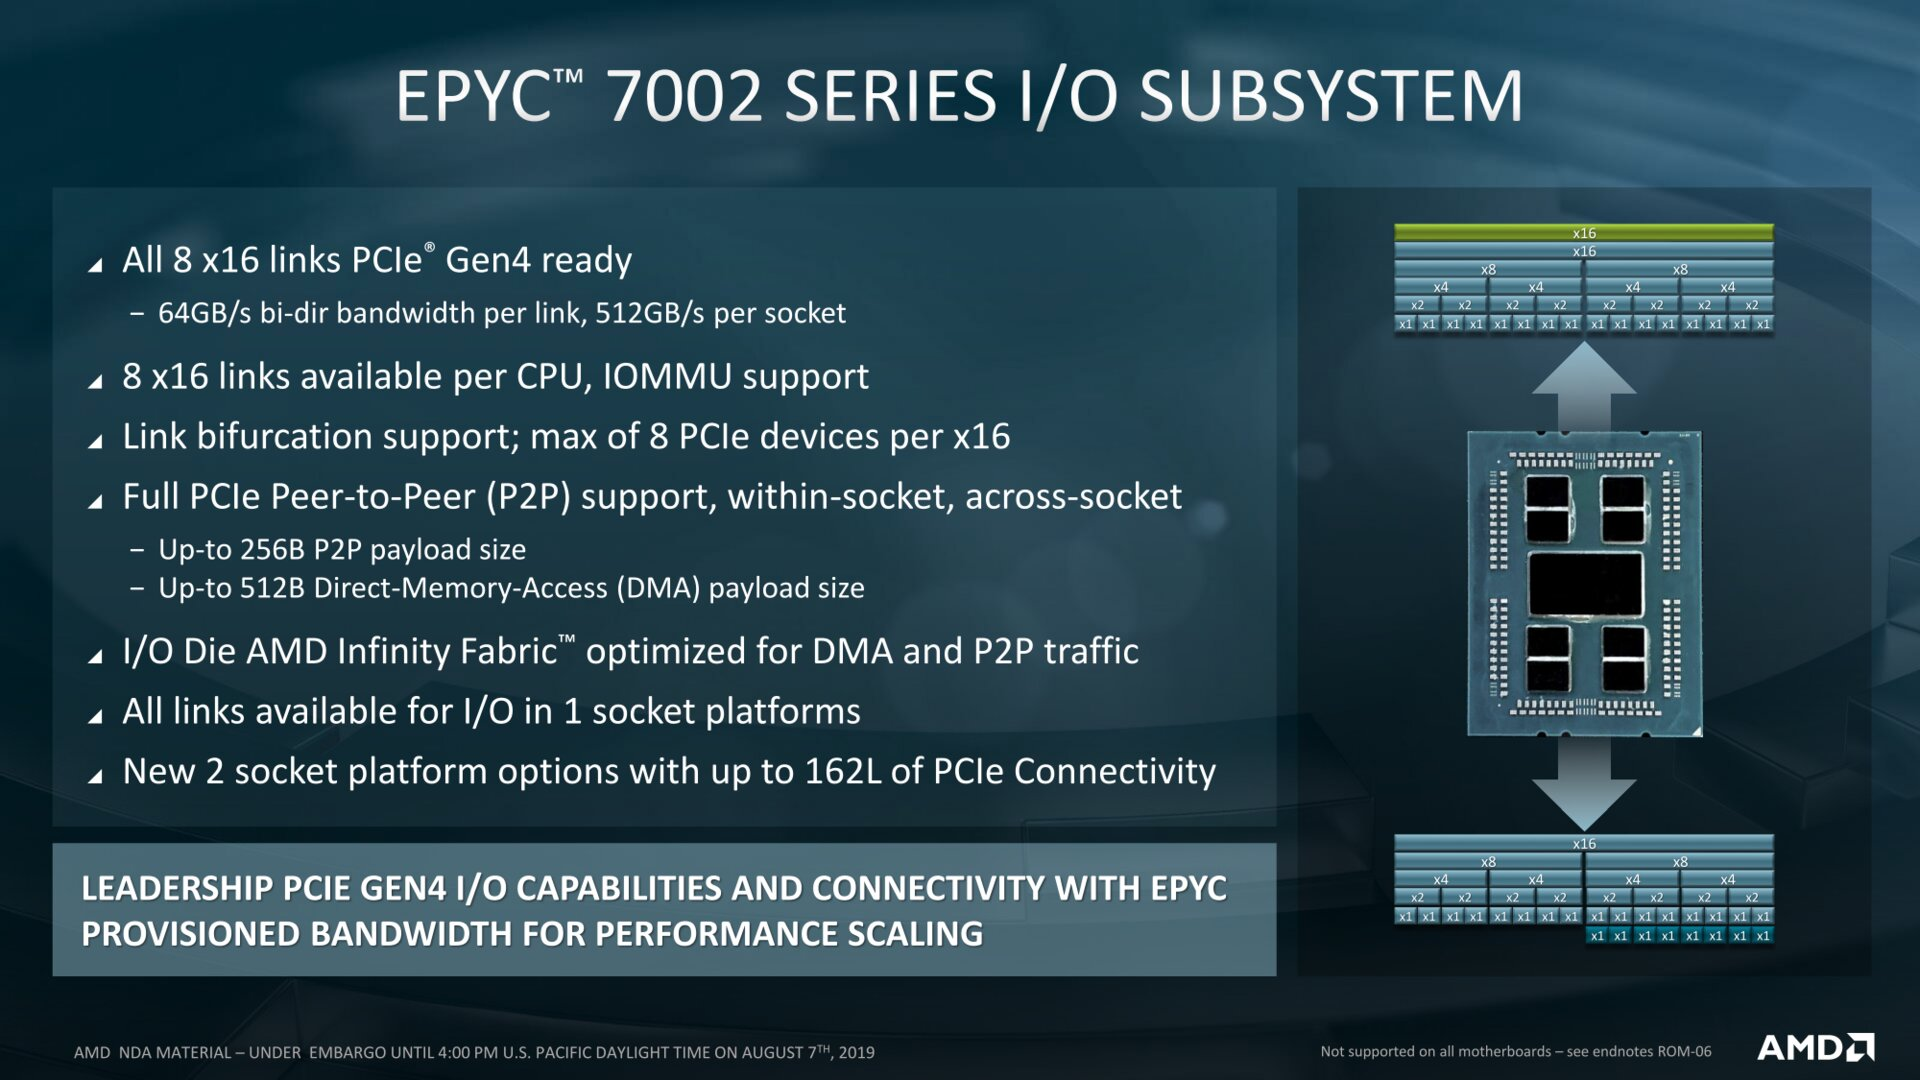 Kombiniert 512 GB/s via PCIe 4.0